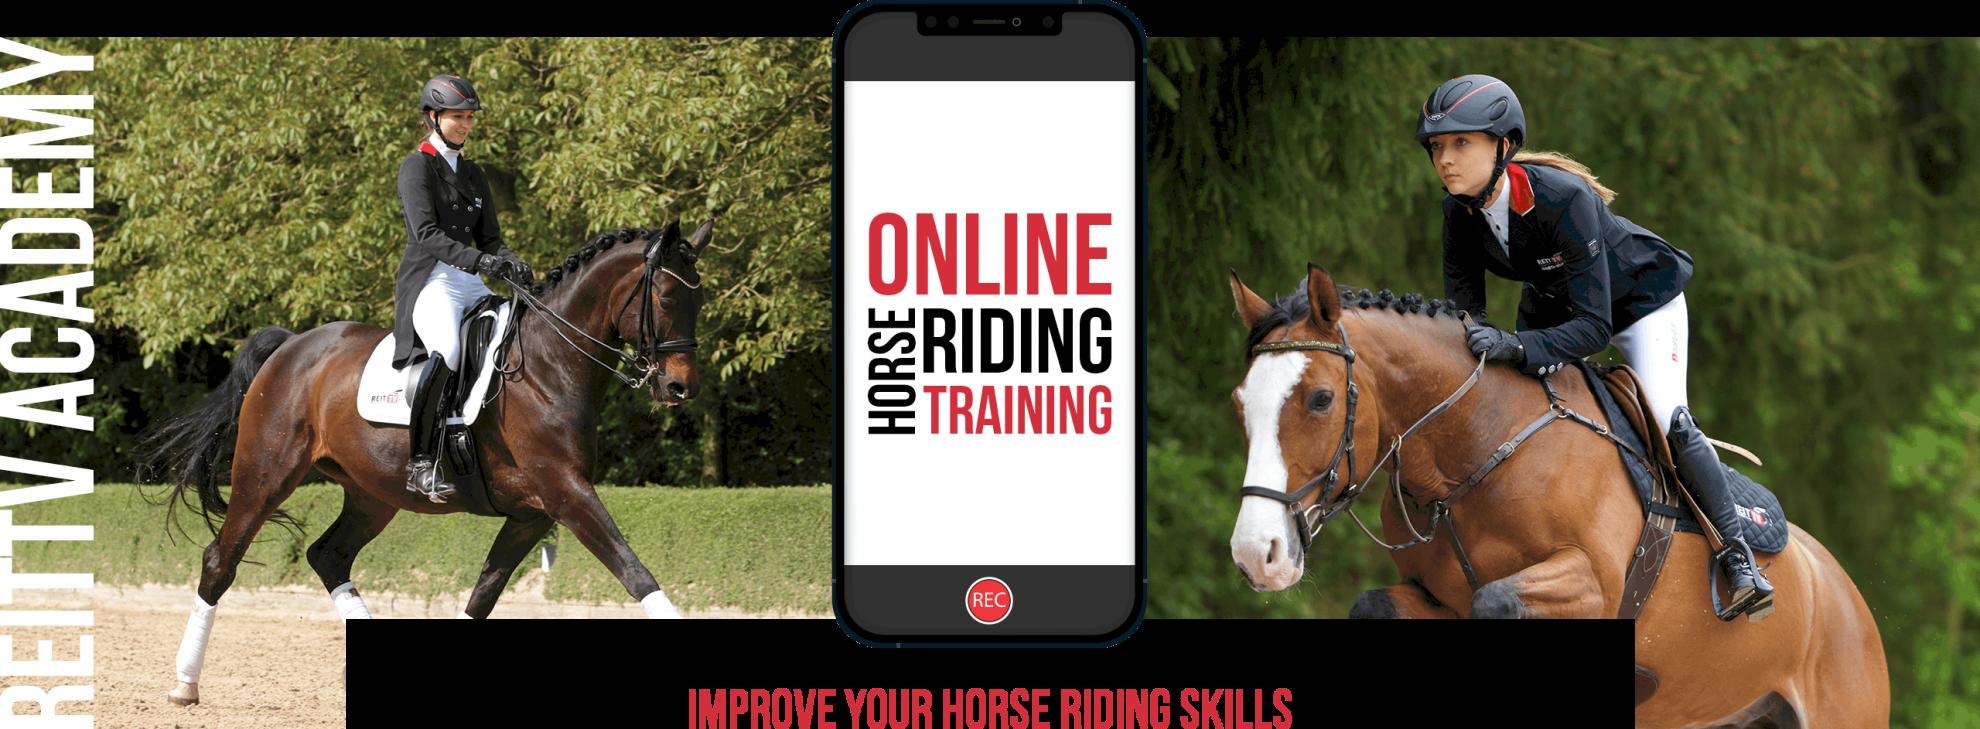 Online horse riding training